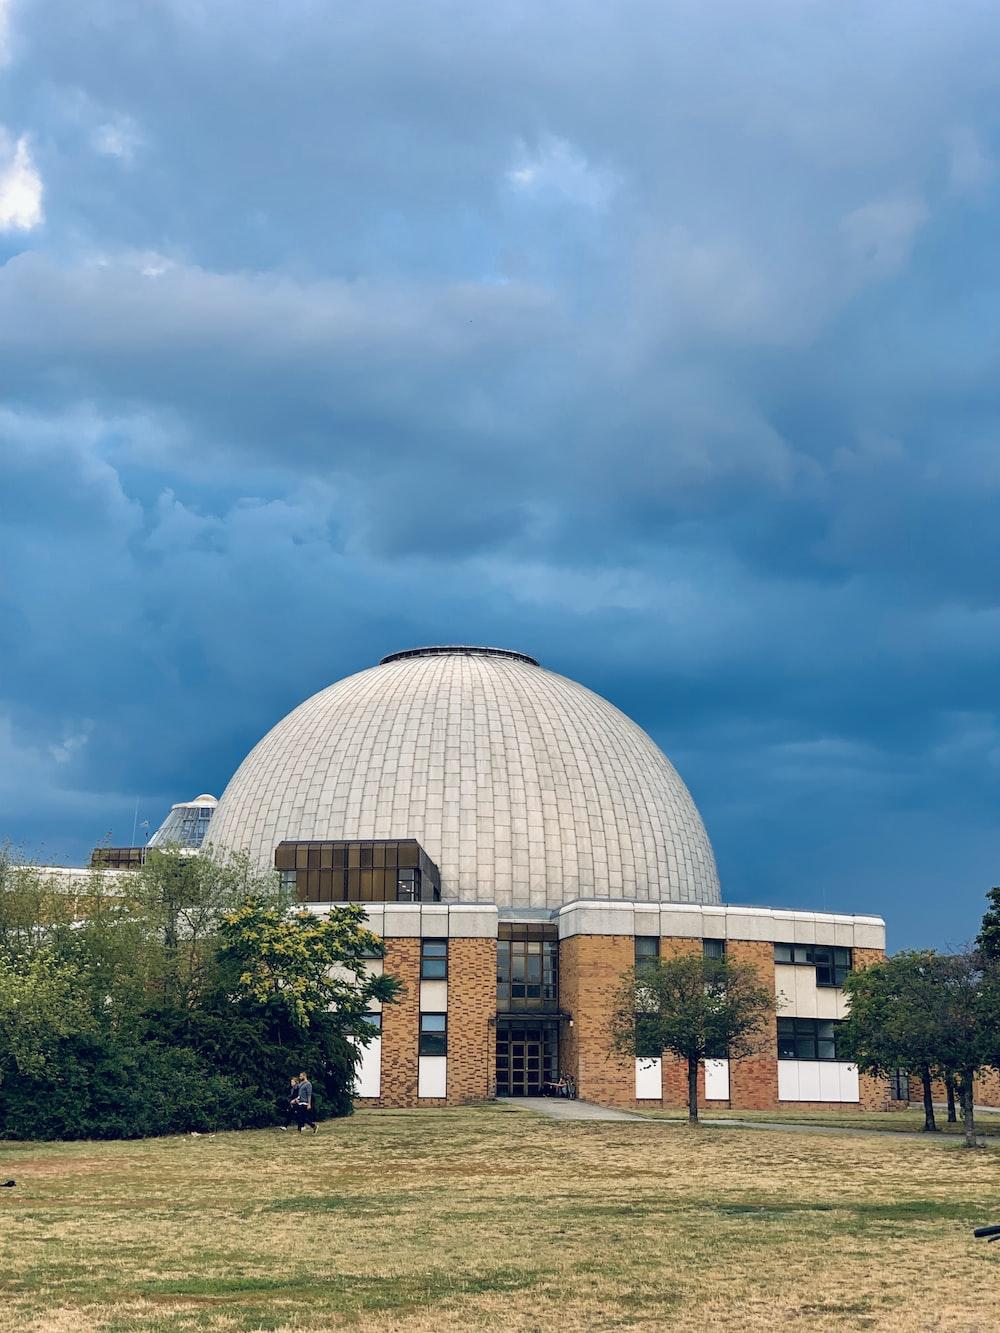 dome building under dark clouds